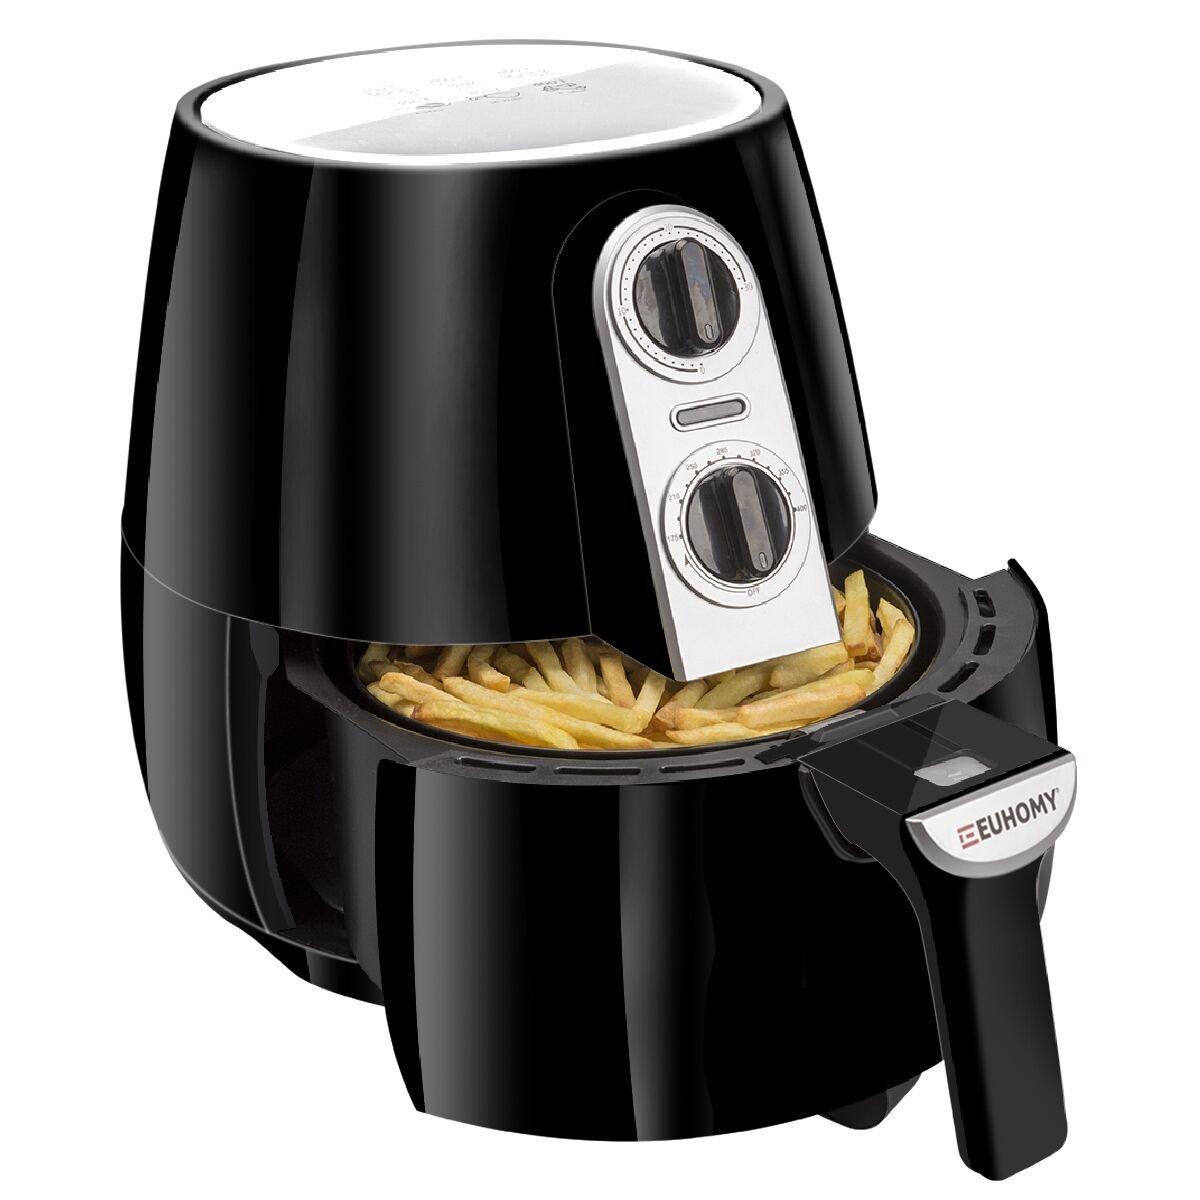 Euhomy Air Fryer, 4.2 Quart Electric Oil-less Fryer with Smart Time & Temperature Control, Cookbook, 1500 Watt, Black Air Cooker